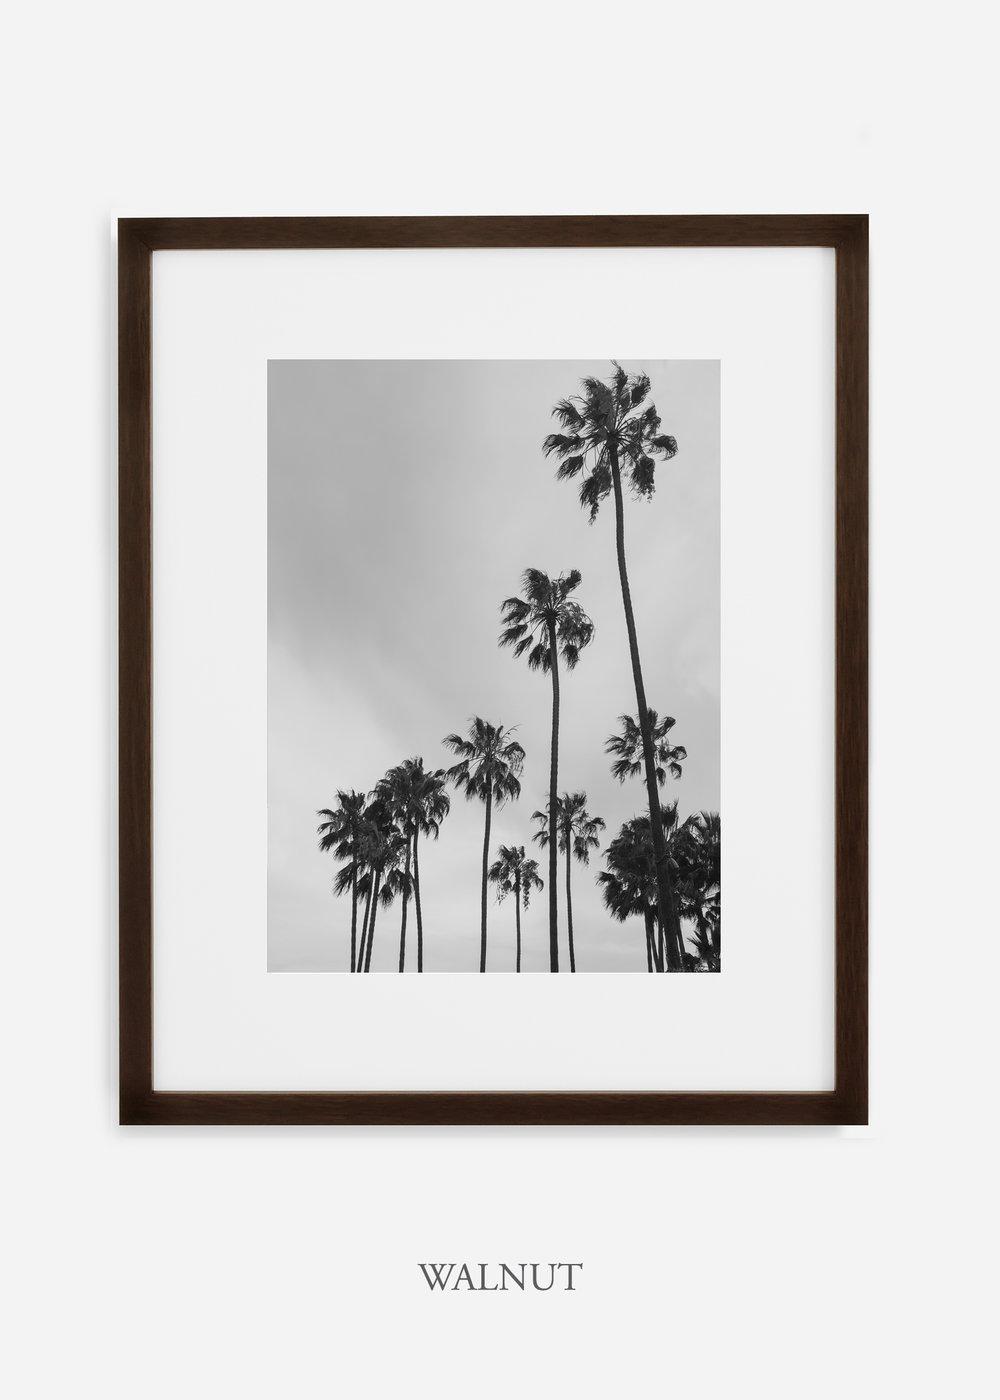 interiordesign_california_losangeles_palmtree_walnutframe.jpg